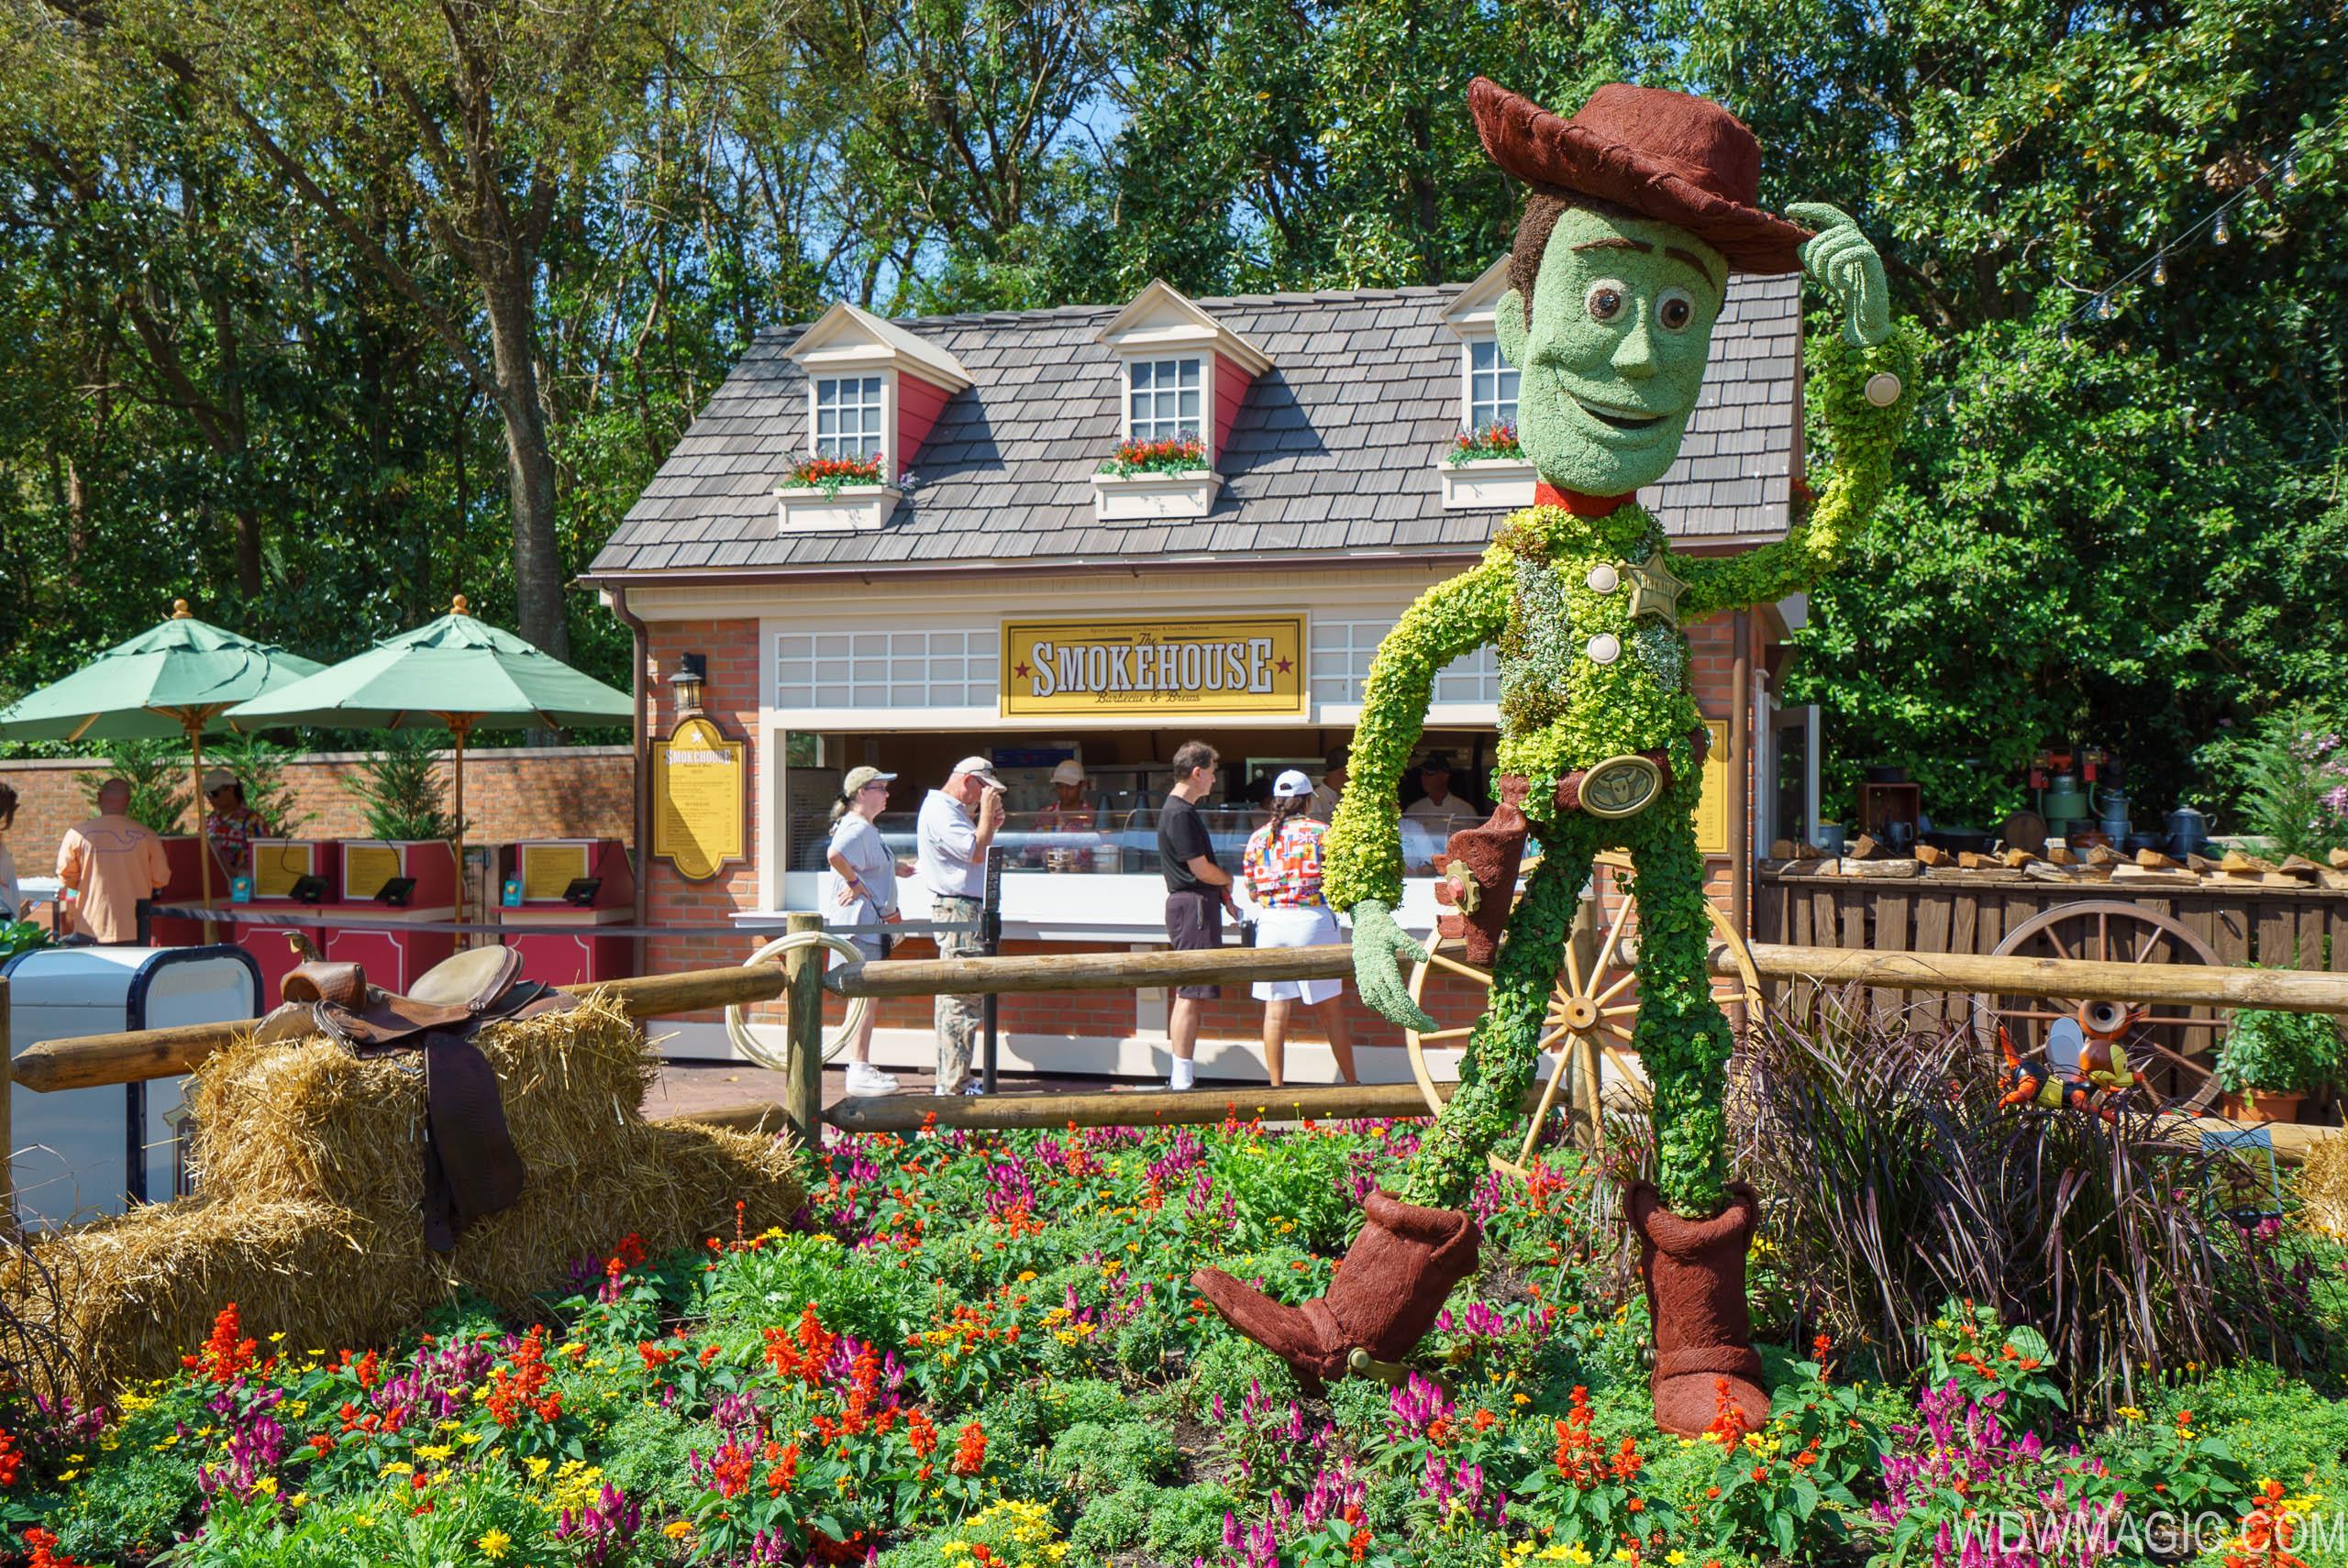 Photos 2018 Epcot Flower And Garden Festival Outdoor Kitchen Kiosks And Menus